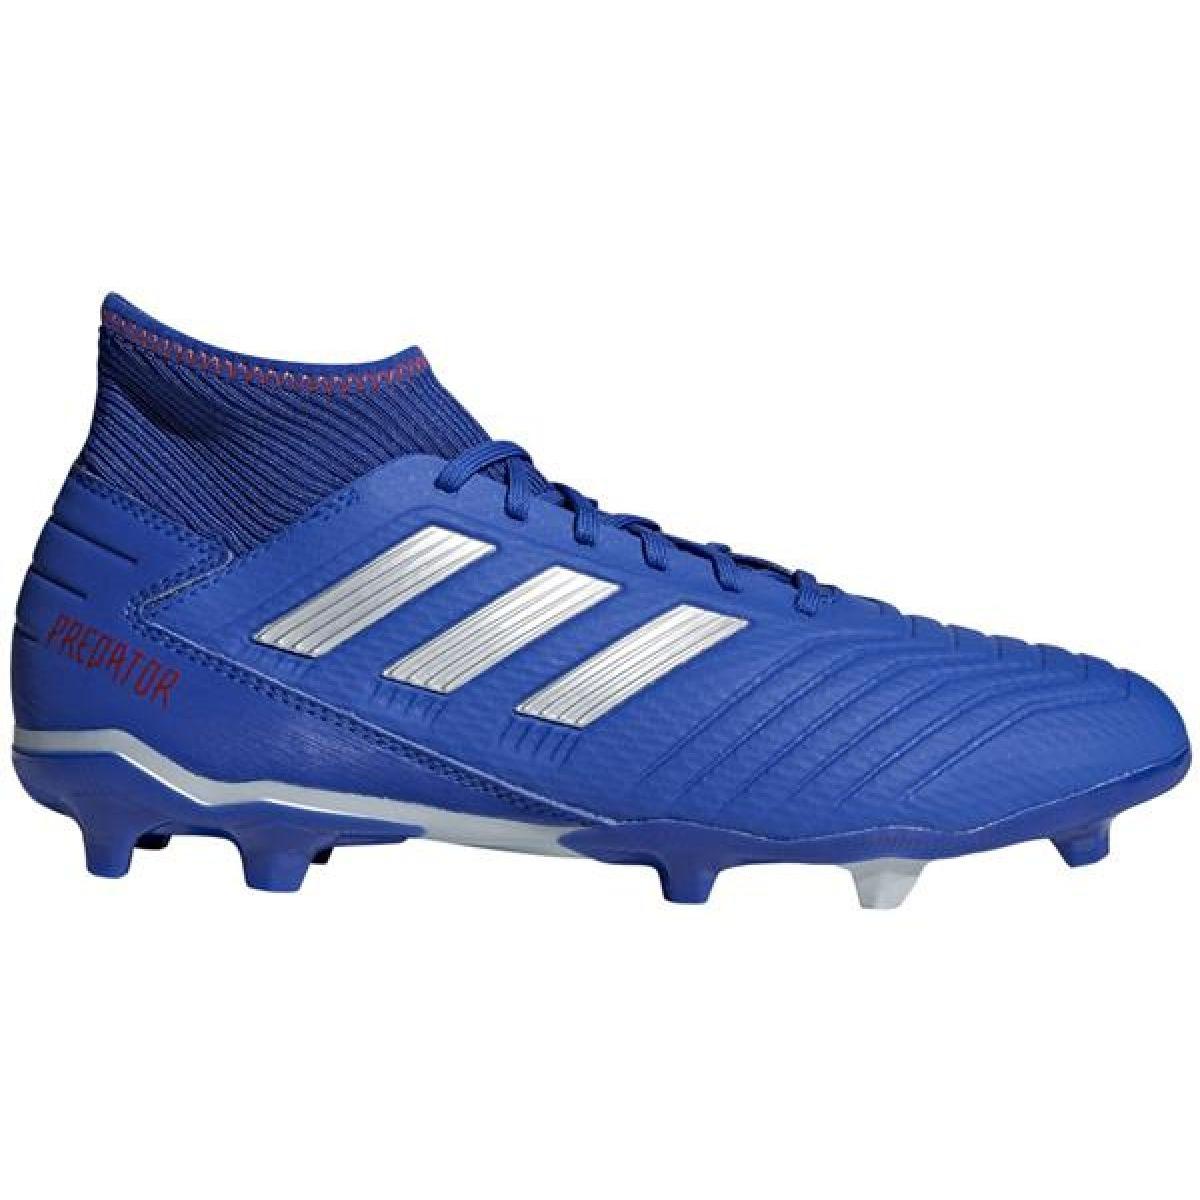 sa34173c fodboldstøvler adidas predator 19.3 fg m saboten